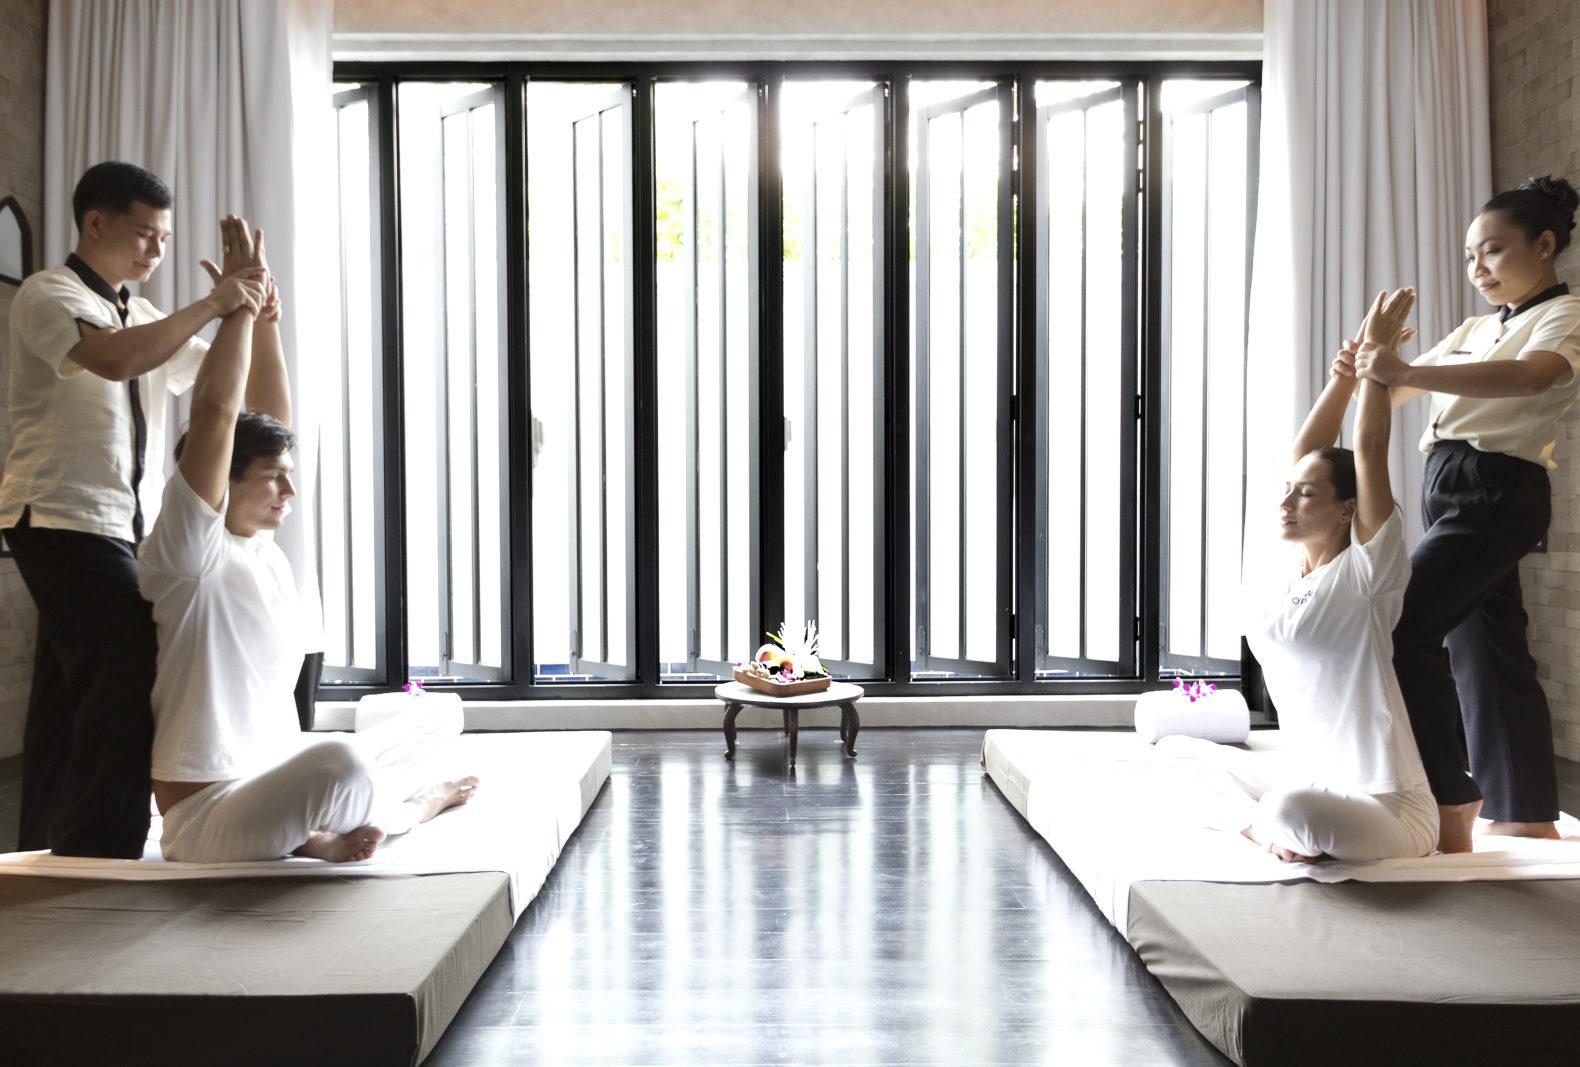 opium-spa-thai-massage-couple-therapist-the-siam-hotel-bangkok-thailand-asia